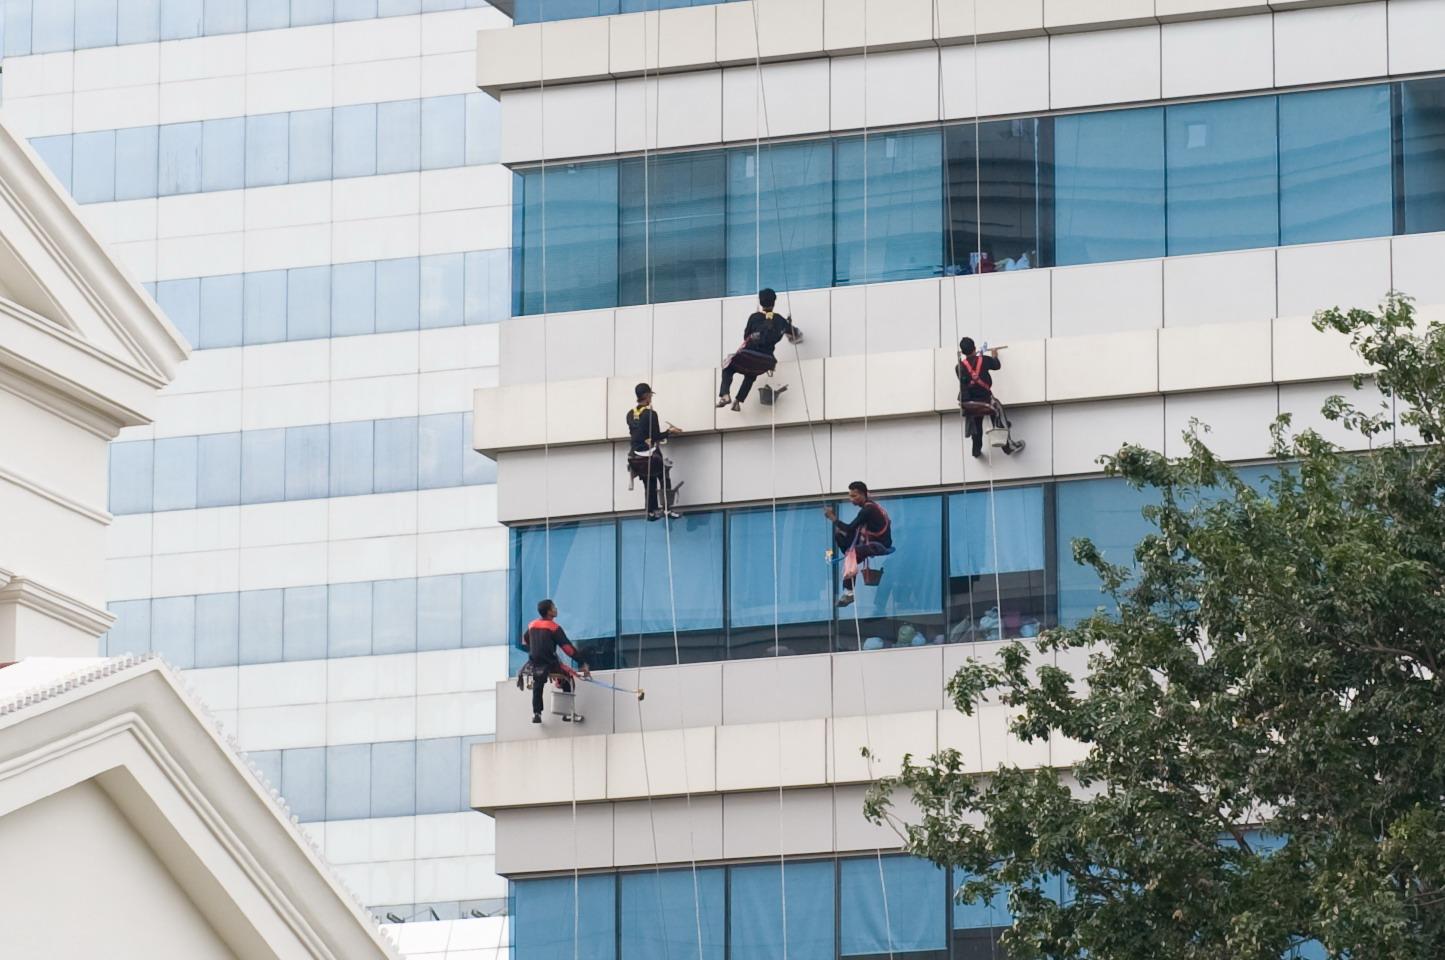 [090527+flying+window+cleaners.jpg]